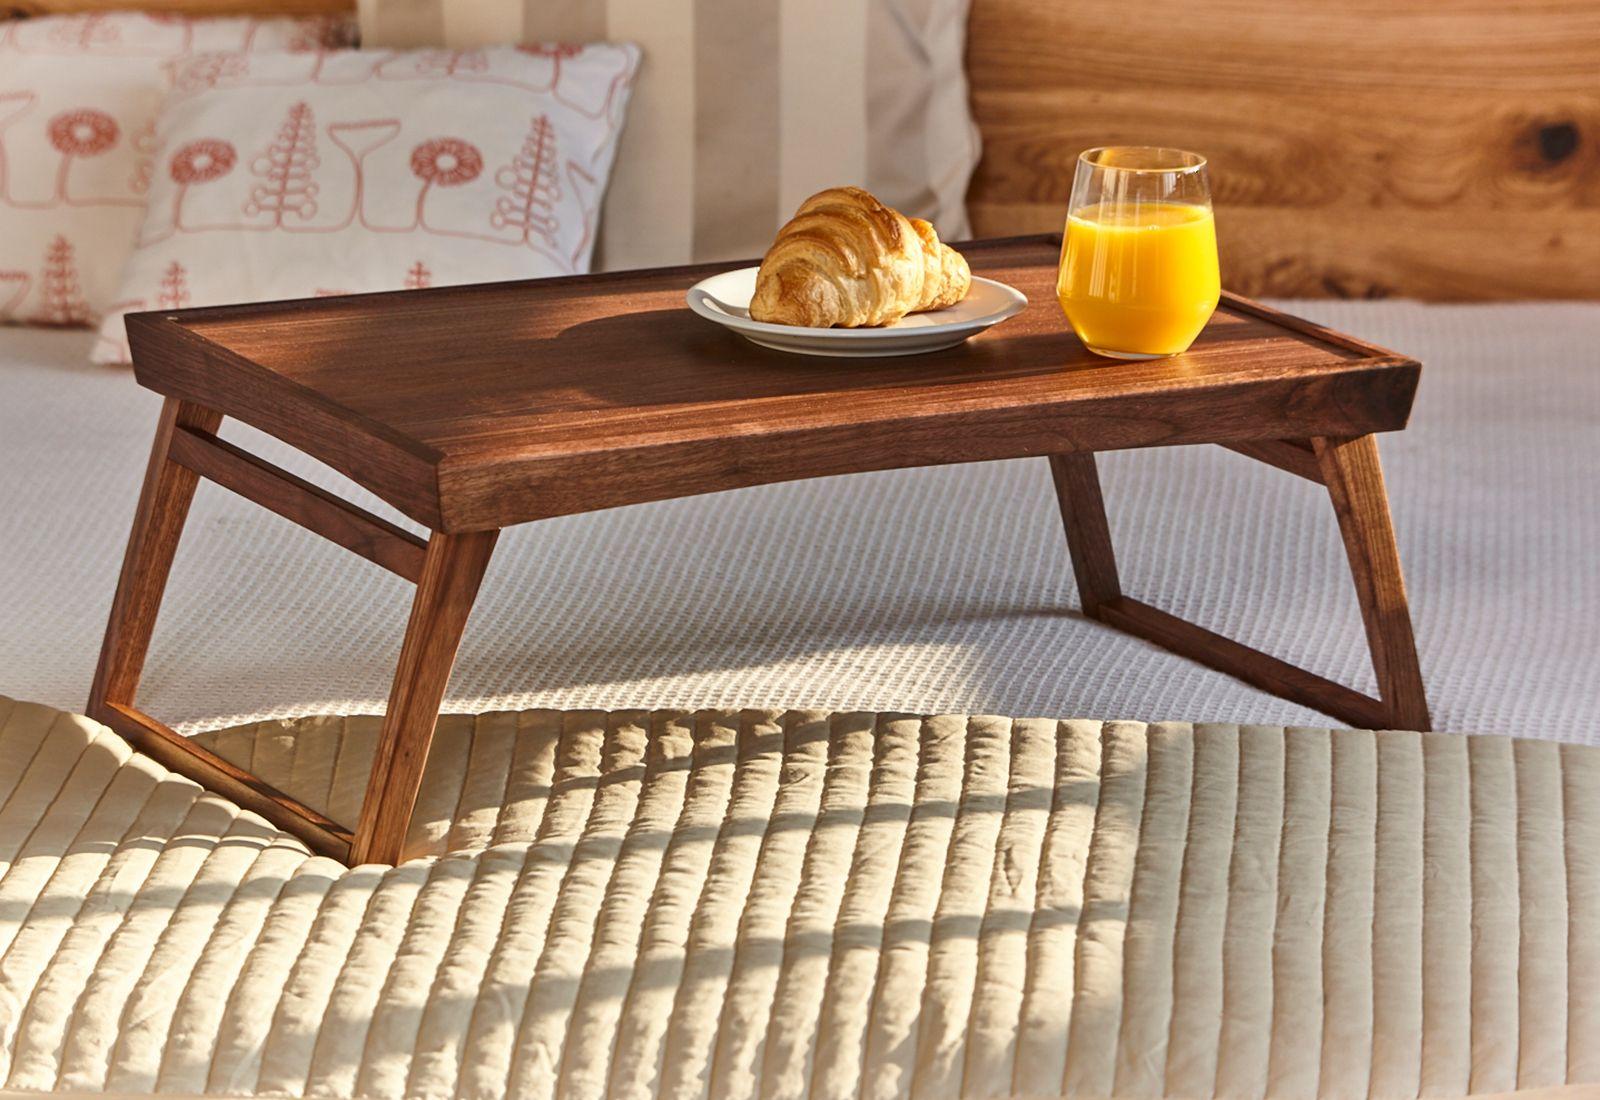 Фото подноса для завтрака